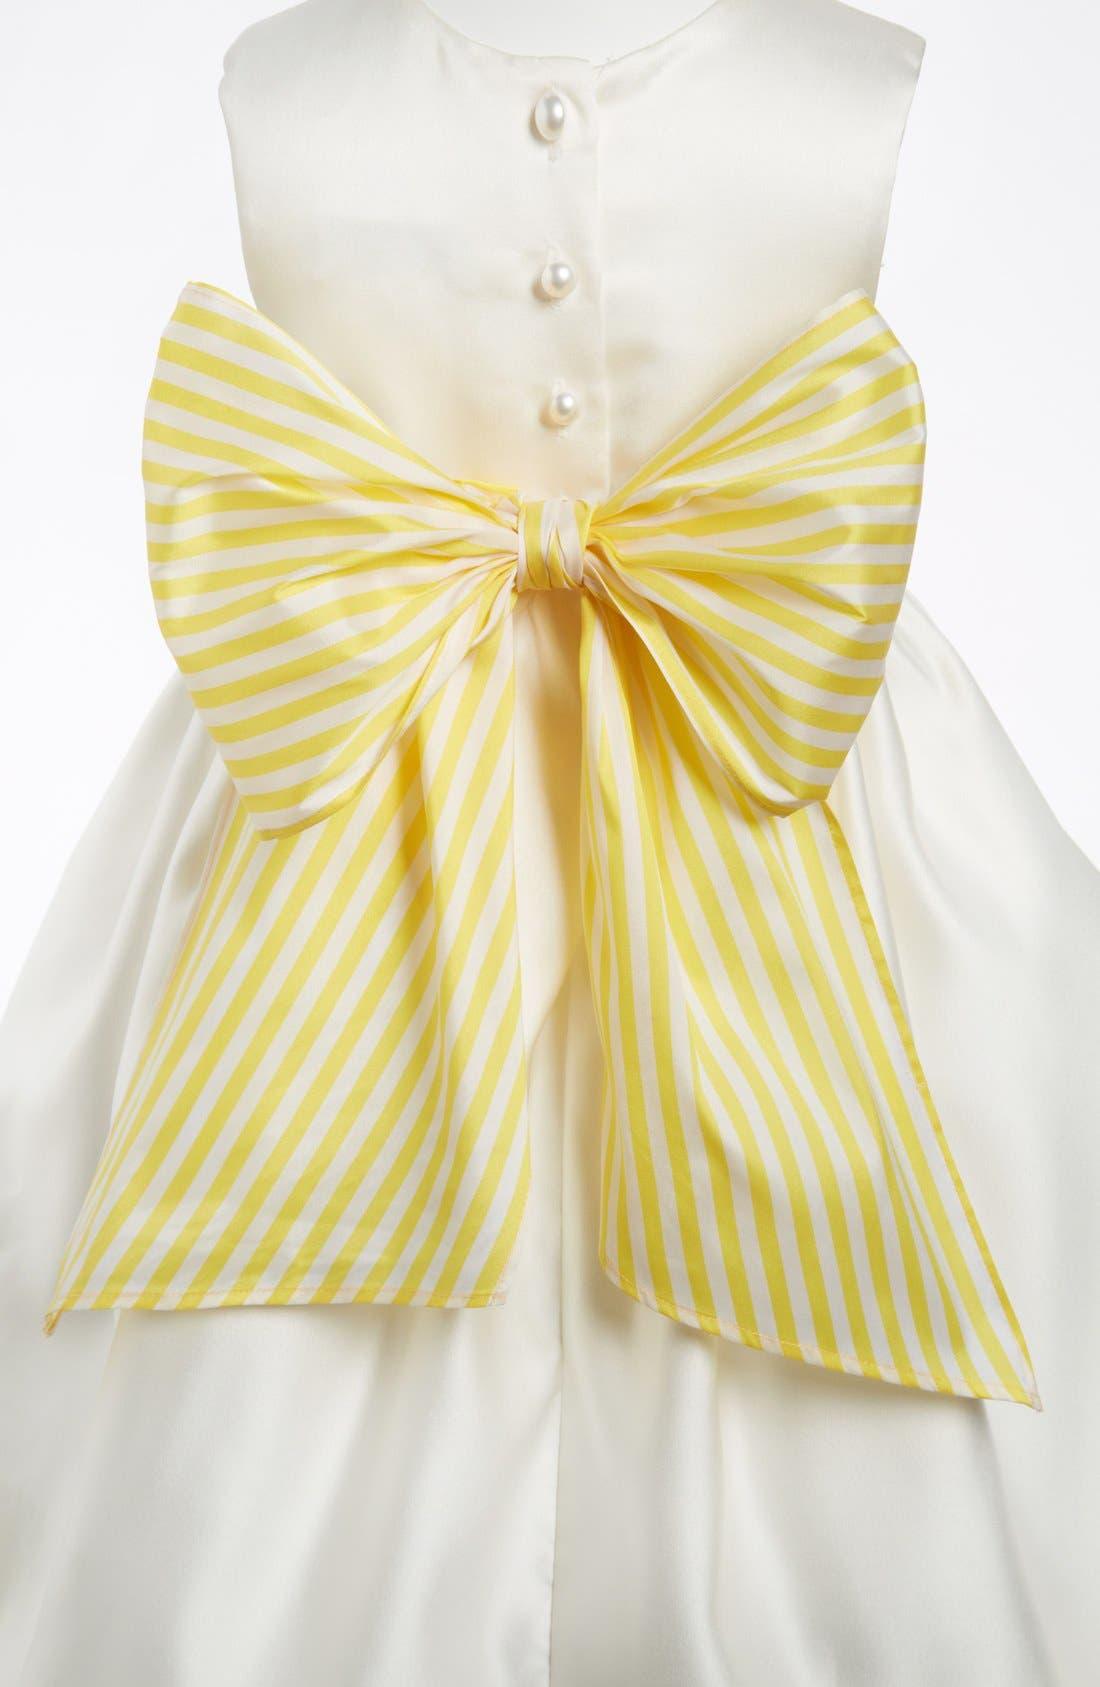 Stripe Sash,                         Main,                         color, YELLOW STRIPE